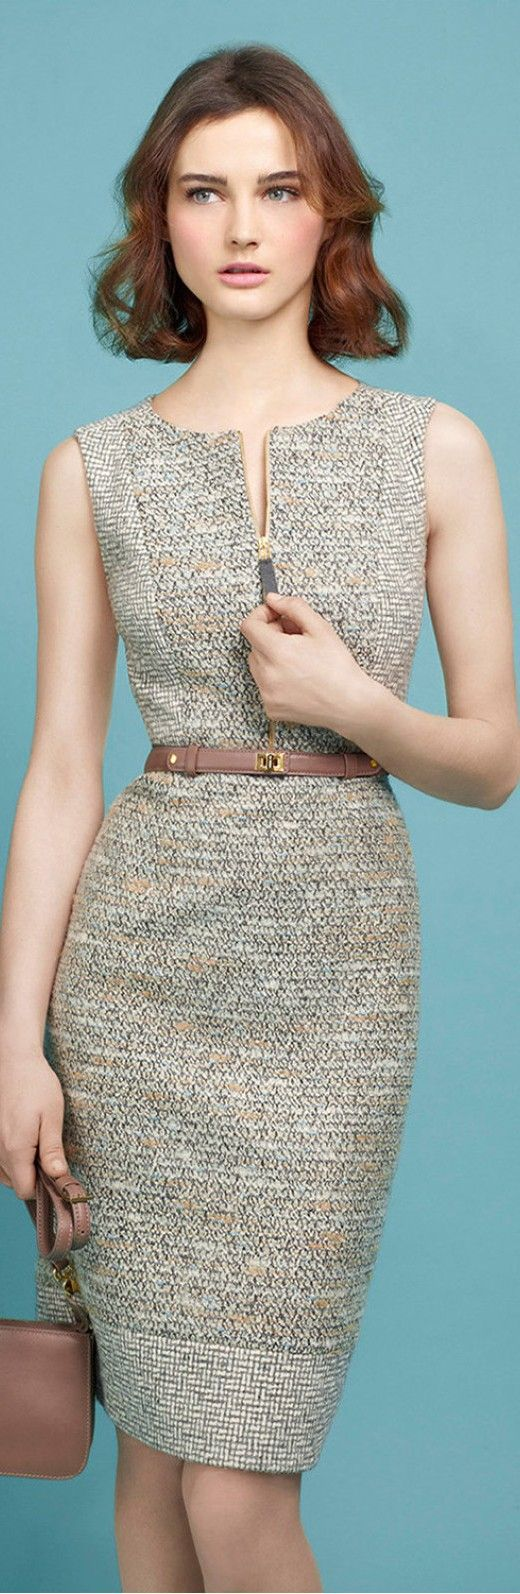 2016 women high quality suit set office ladies work wear women ol tweed midi dress outfit